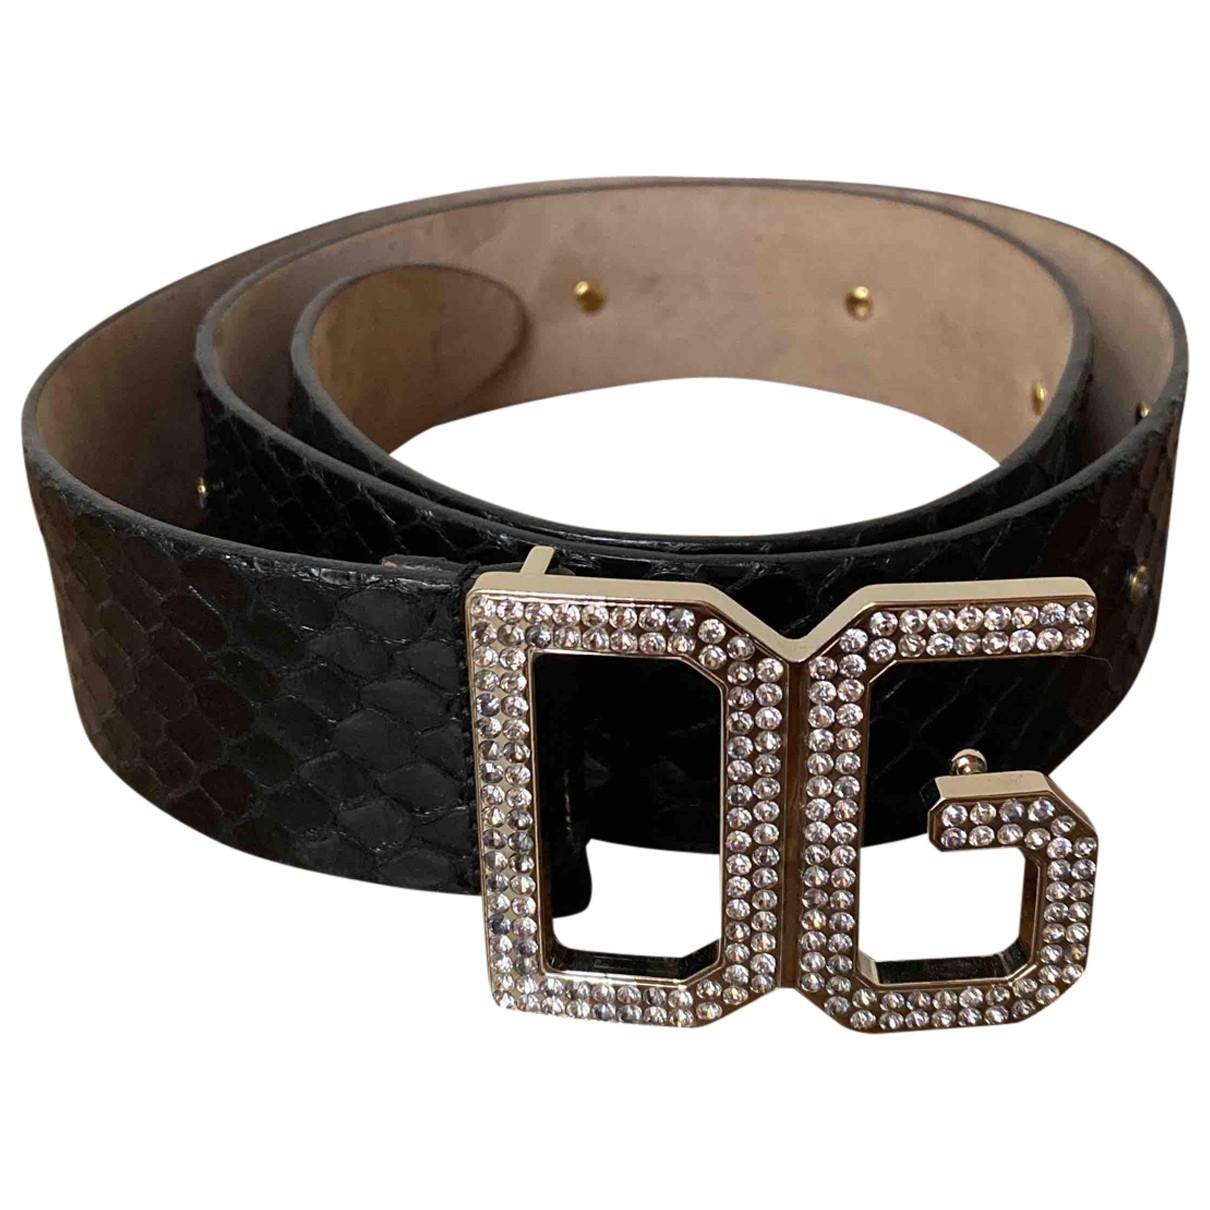 Cinturon de Cueros exoticos Dolce & Gabbana